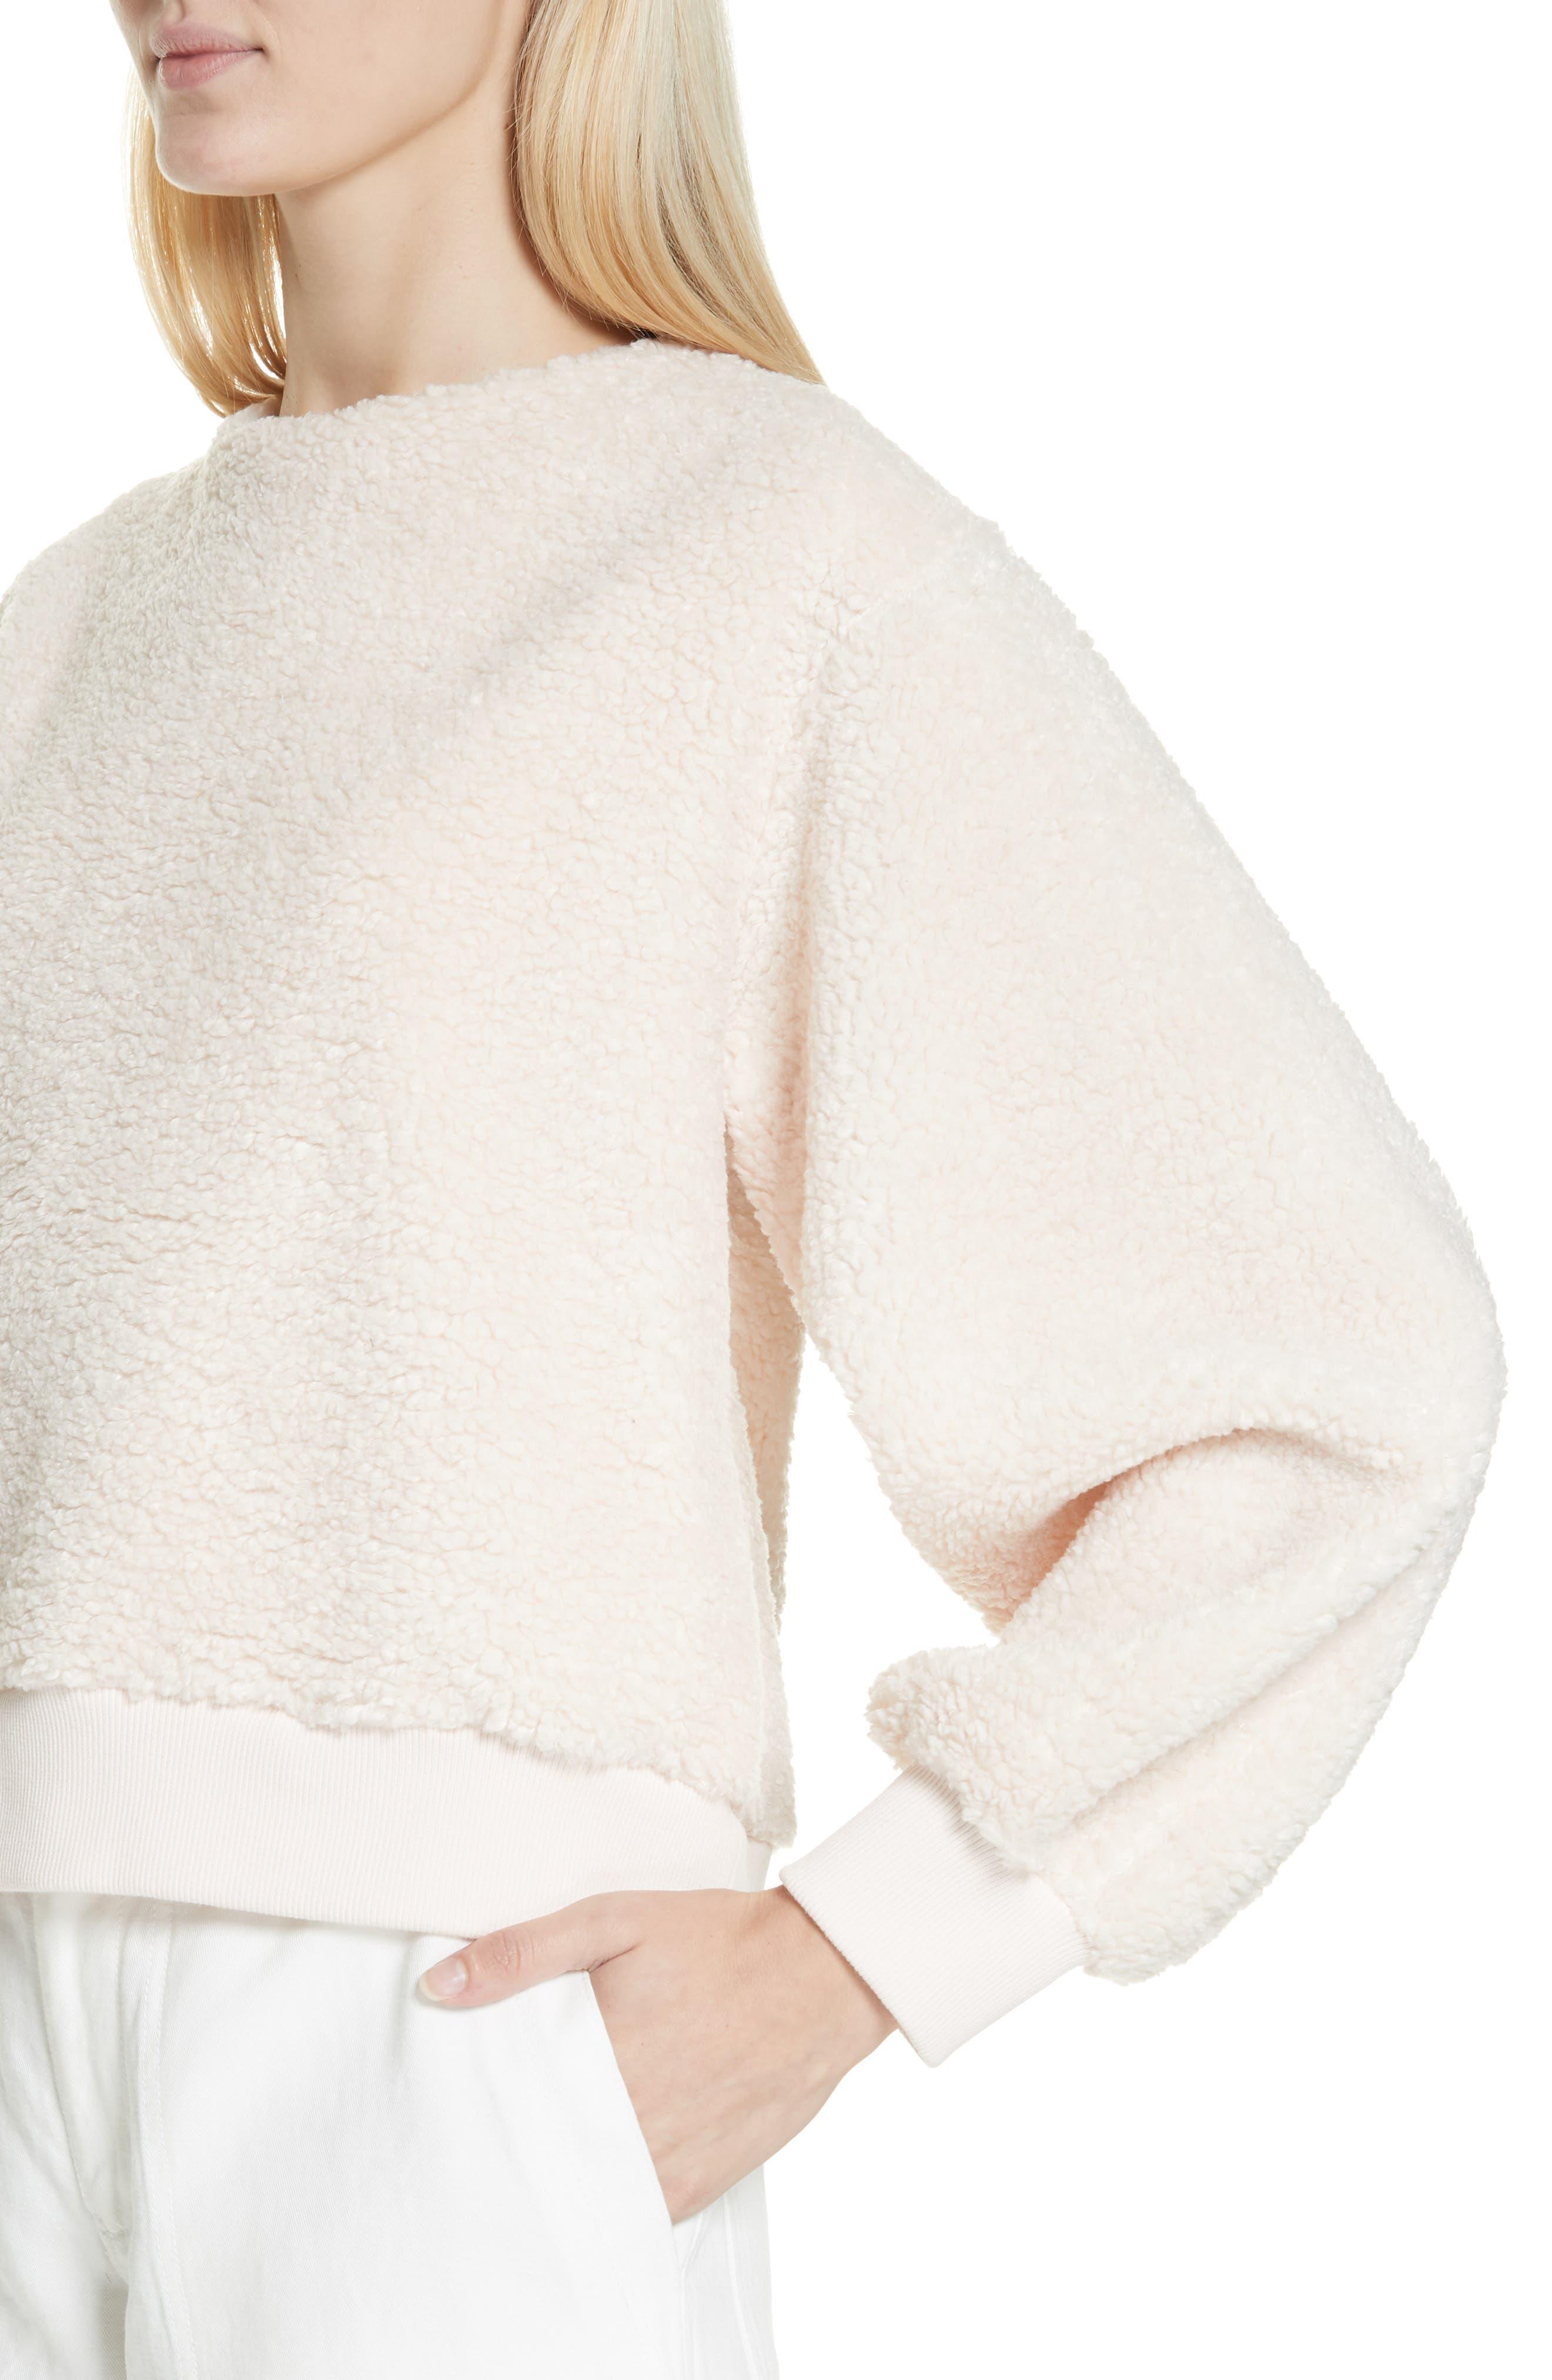 VINCE, Cozy Fleece Pullover, Alternate thumbnail 4, color, SOFT PINK